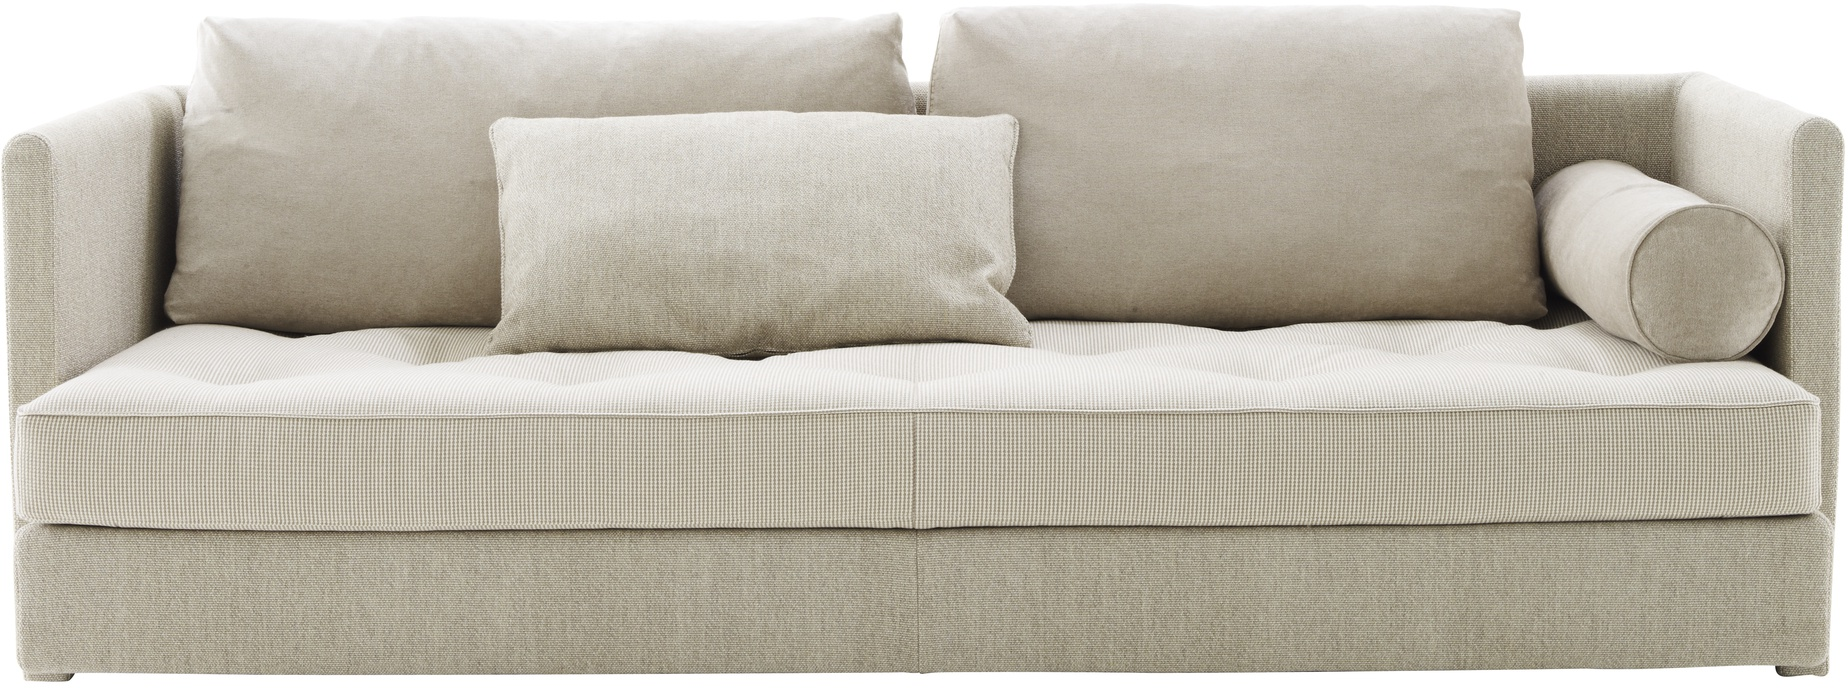 Nomade 2 sofas designer didier gomez ligne roset - Ligne roset nomade sofa ...